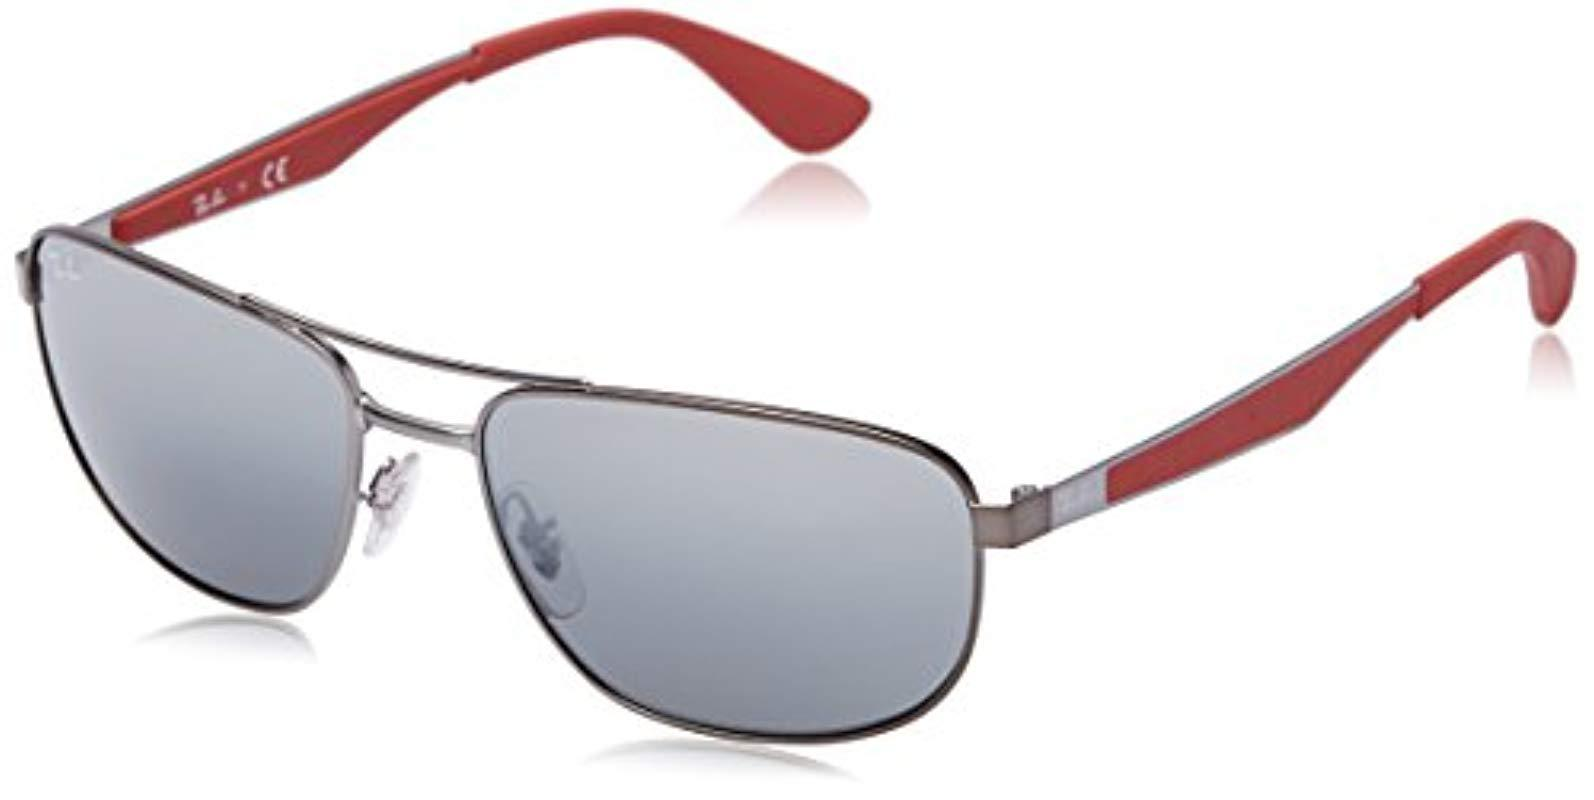 f3529c8e999 Lyst - Ray-Ban Ray Ban Non-polarized Sunglasses 58 for Men